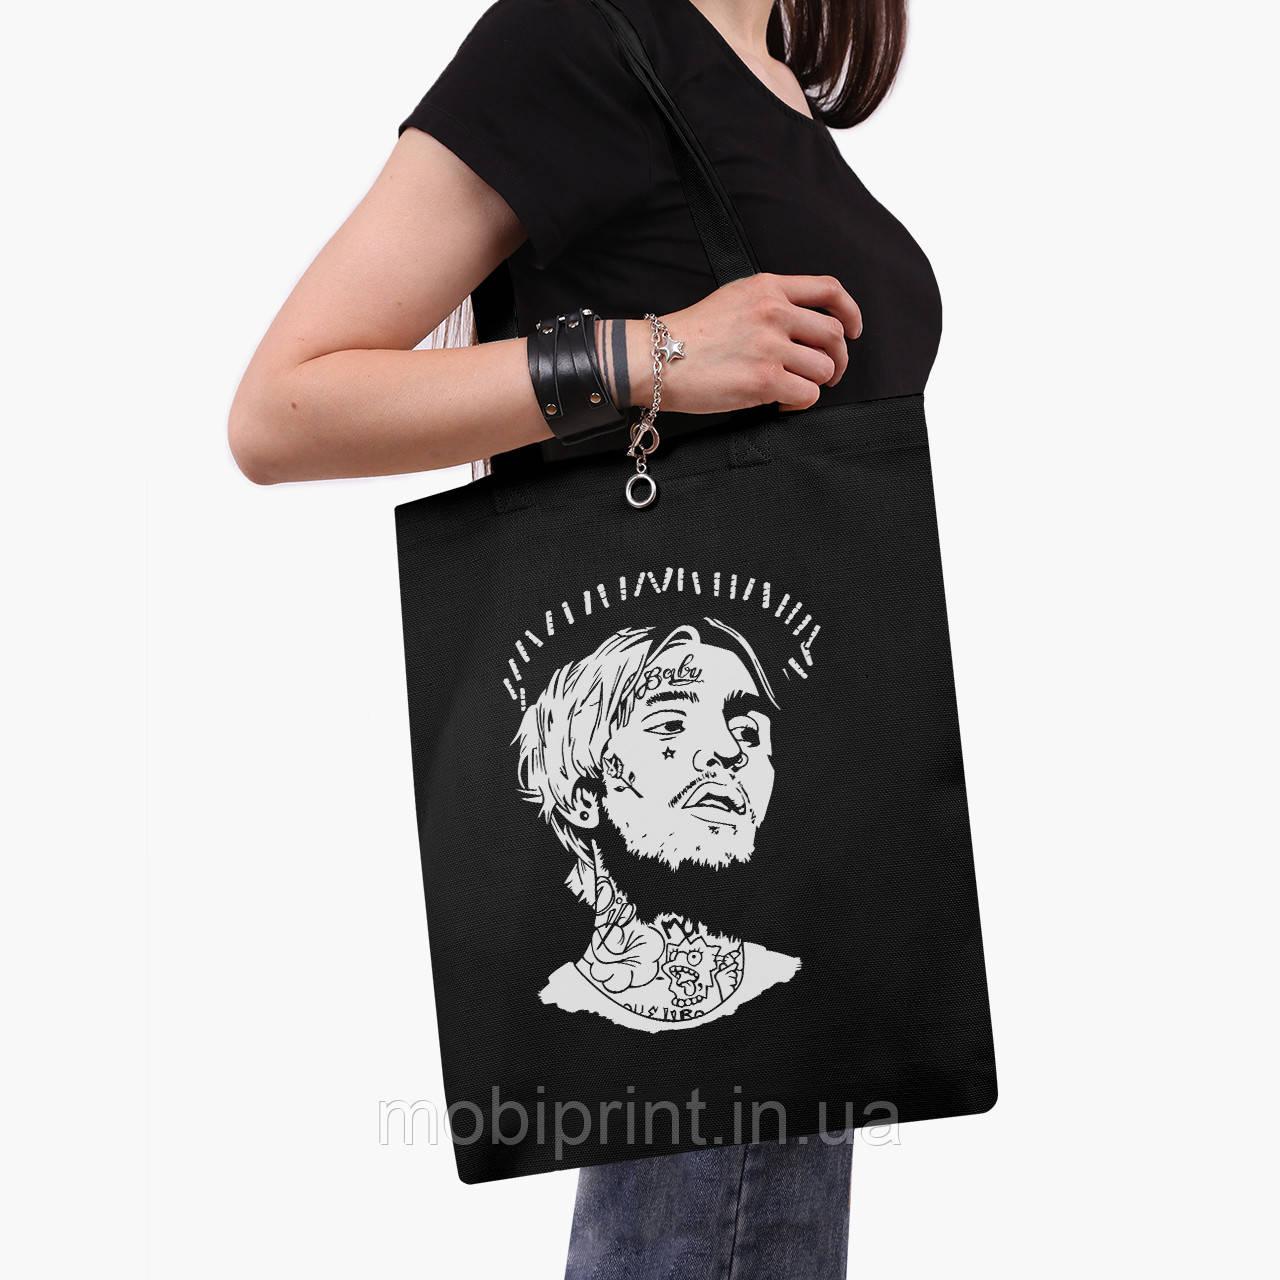 Эко сумка шоппер черная Лил Пип (Lil Peep) (9227-2634-2)  41*35 см